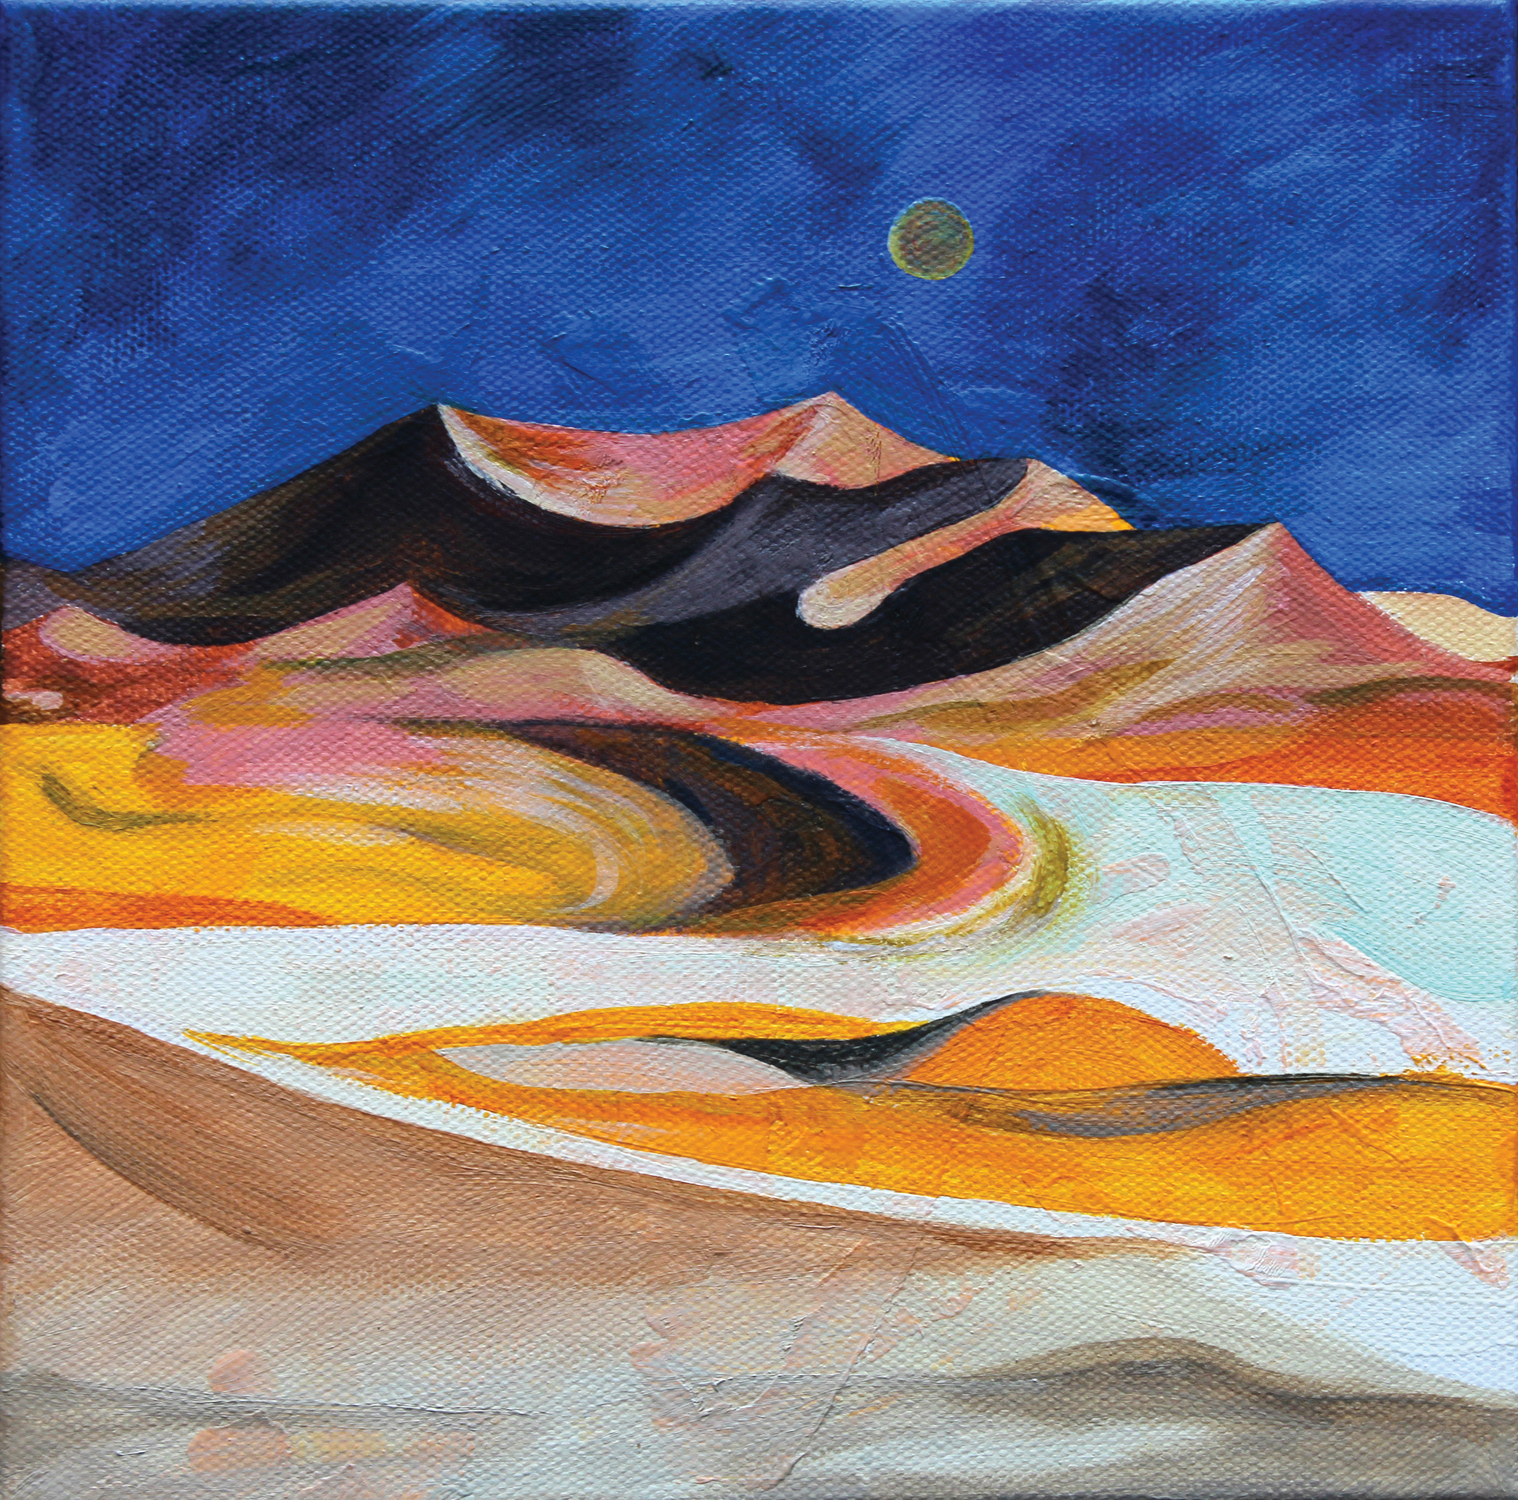 A desert in San diego  27x27cm Acrylic on Canvas._2014